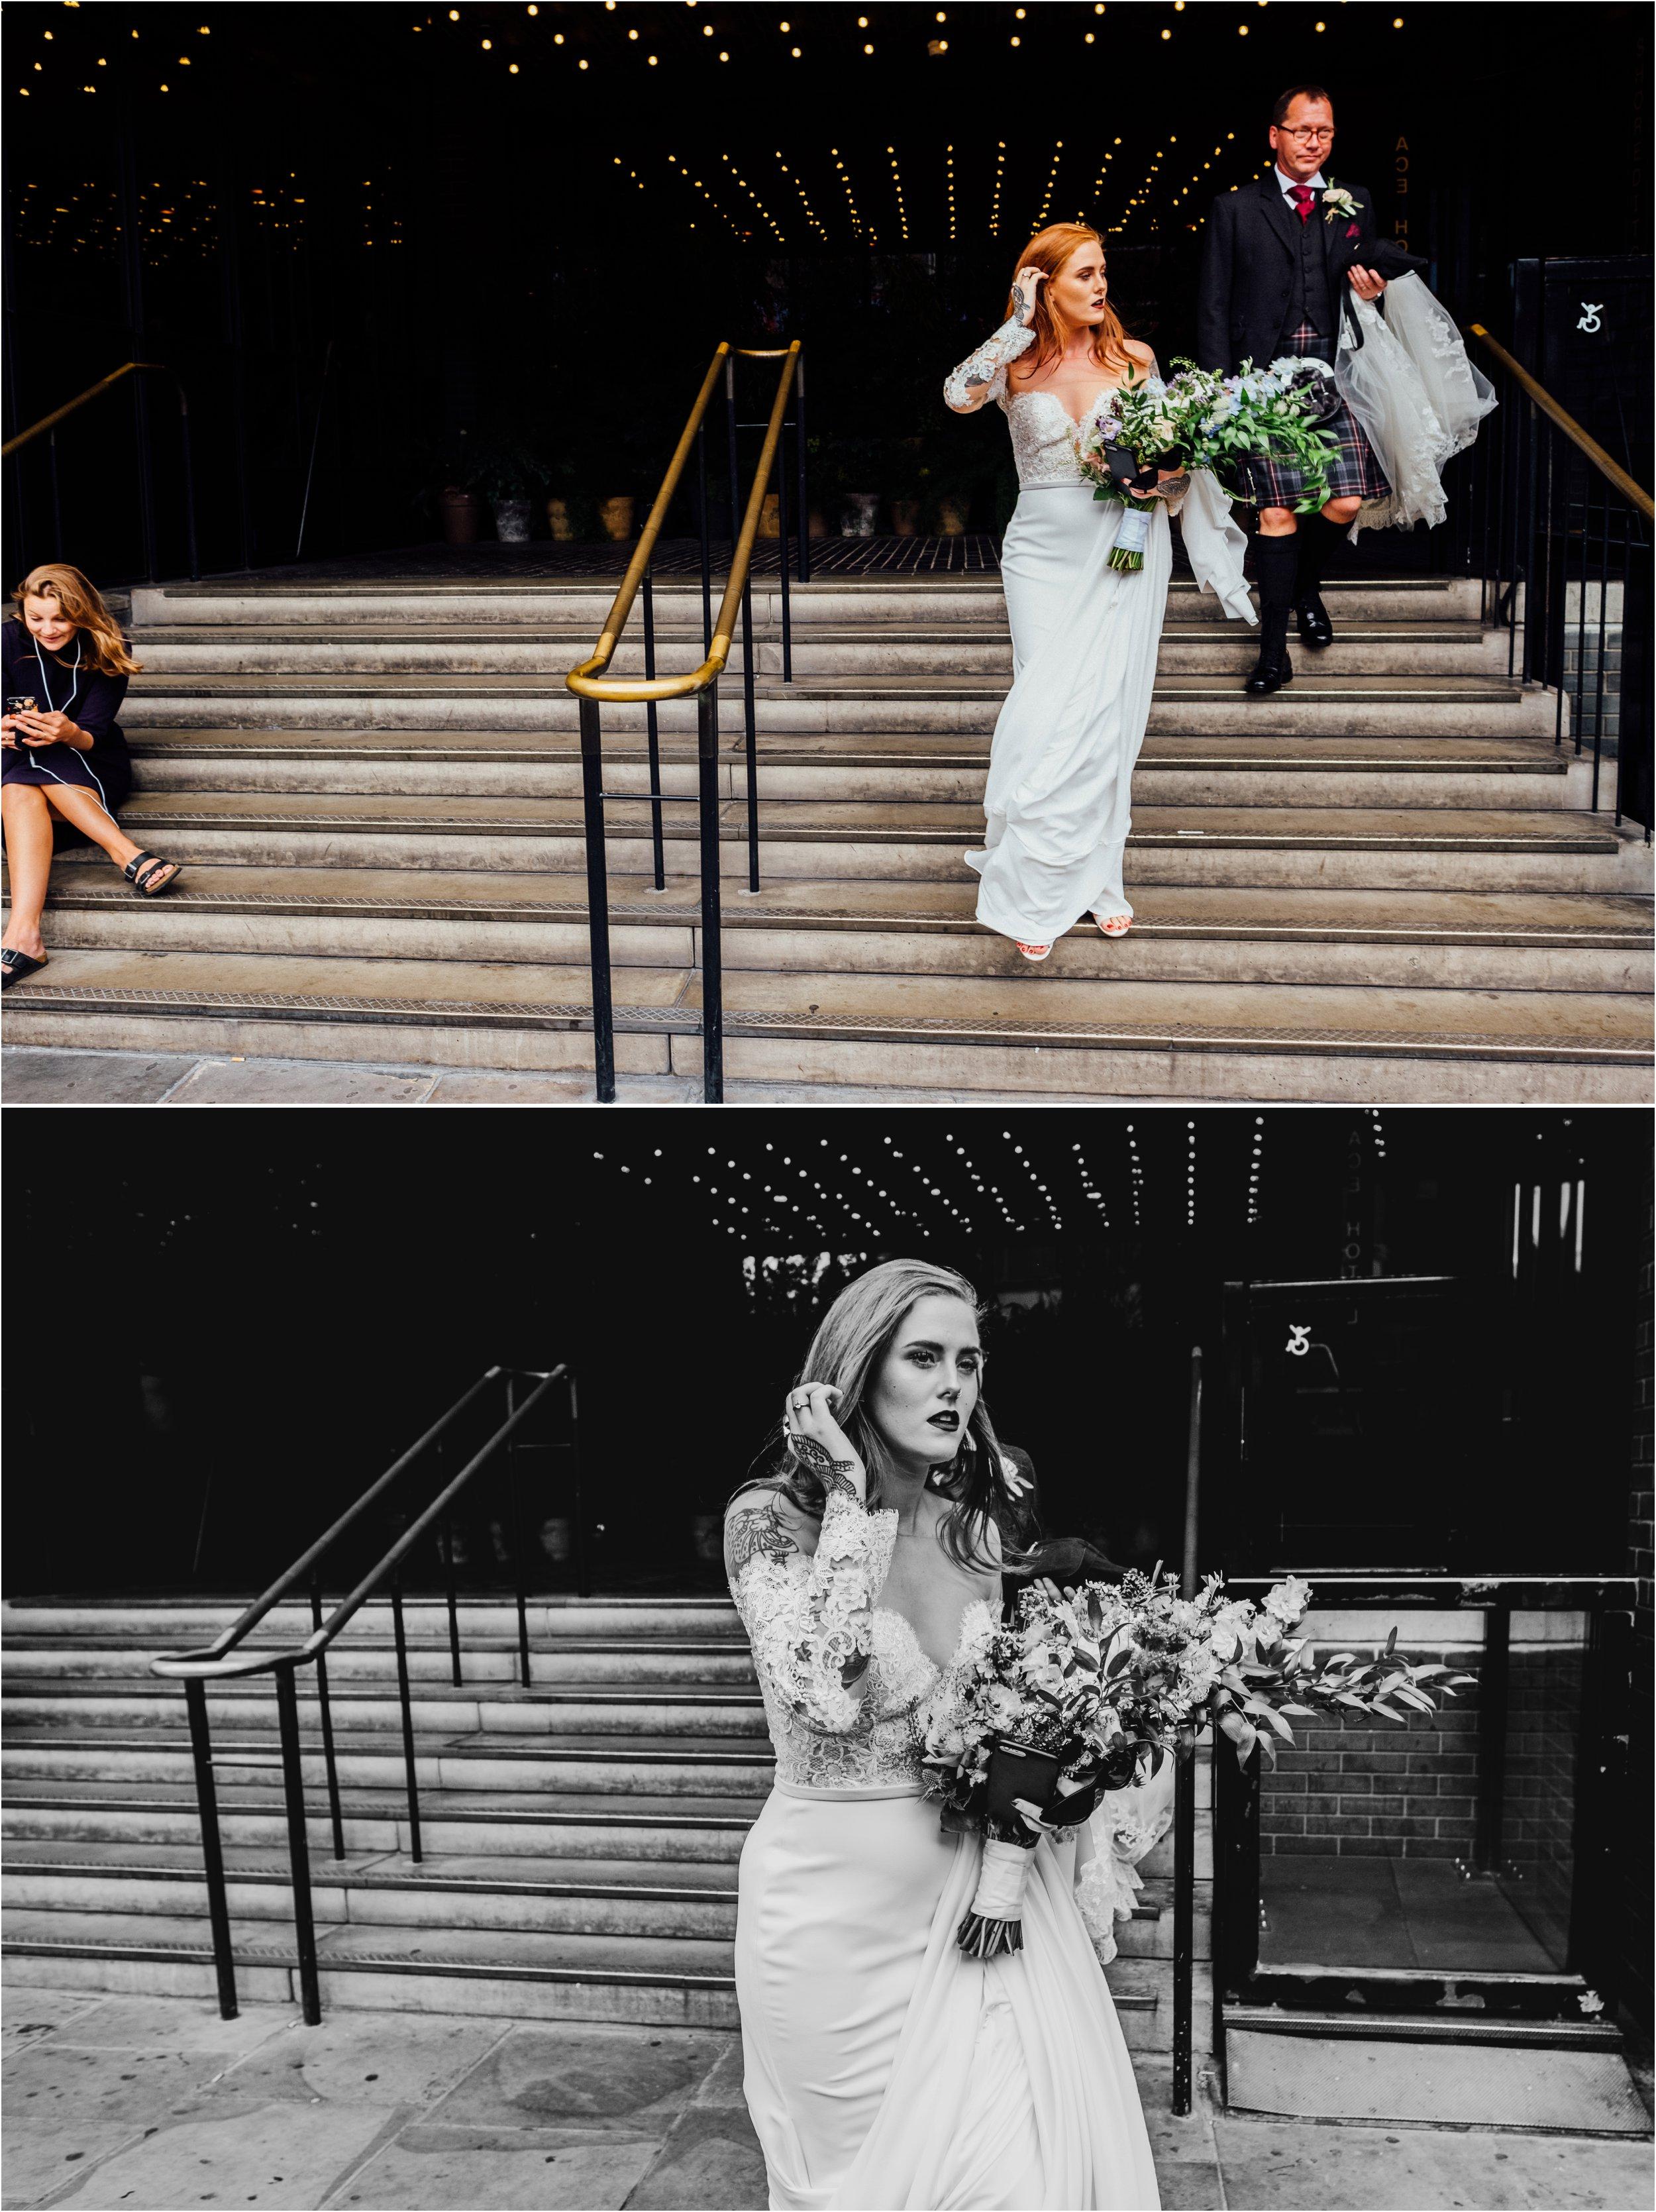 Hackney town hall wedding photography_0036.jpg